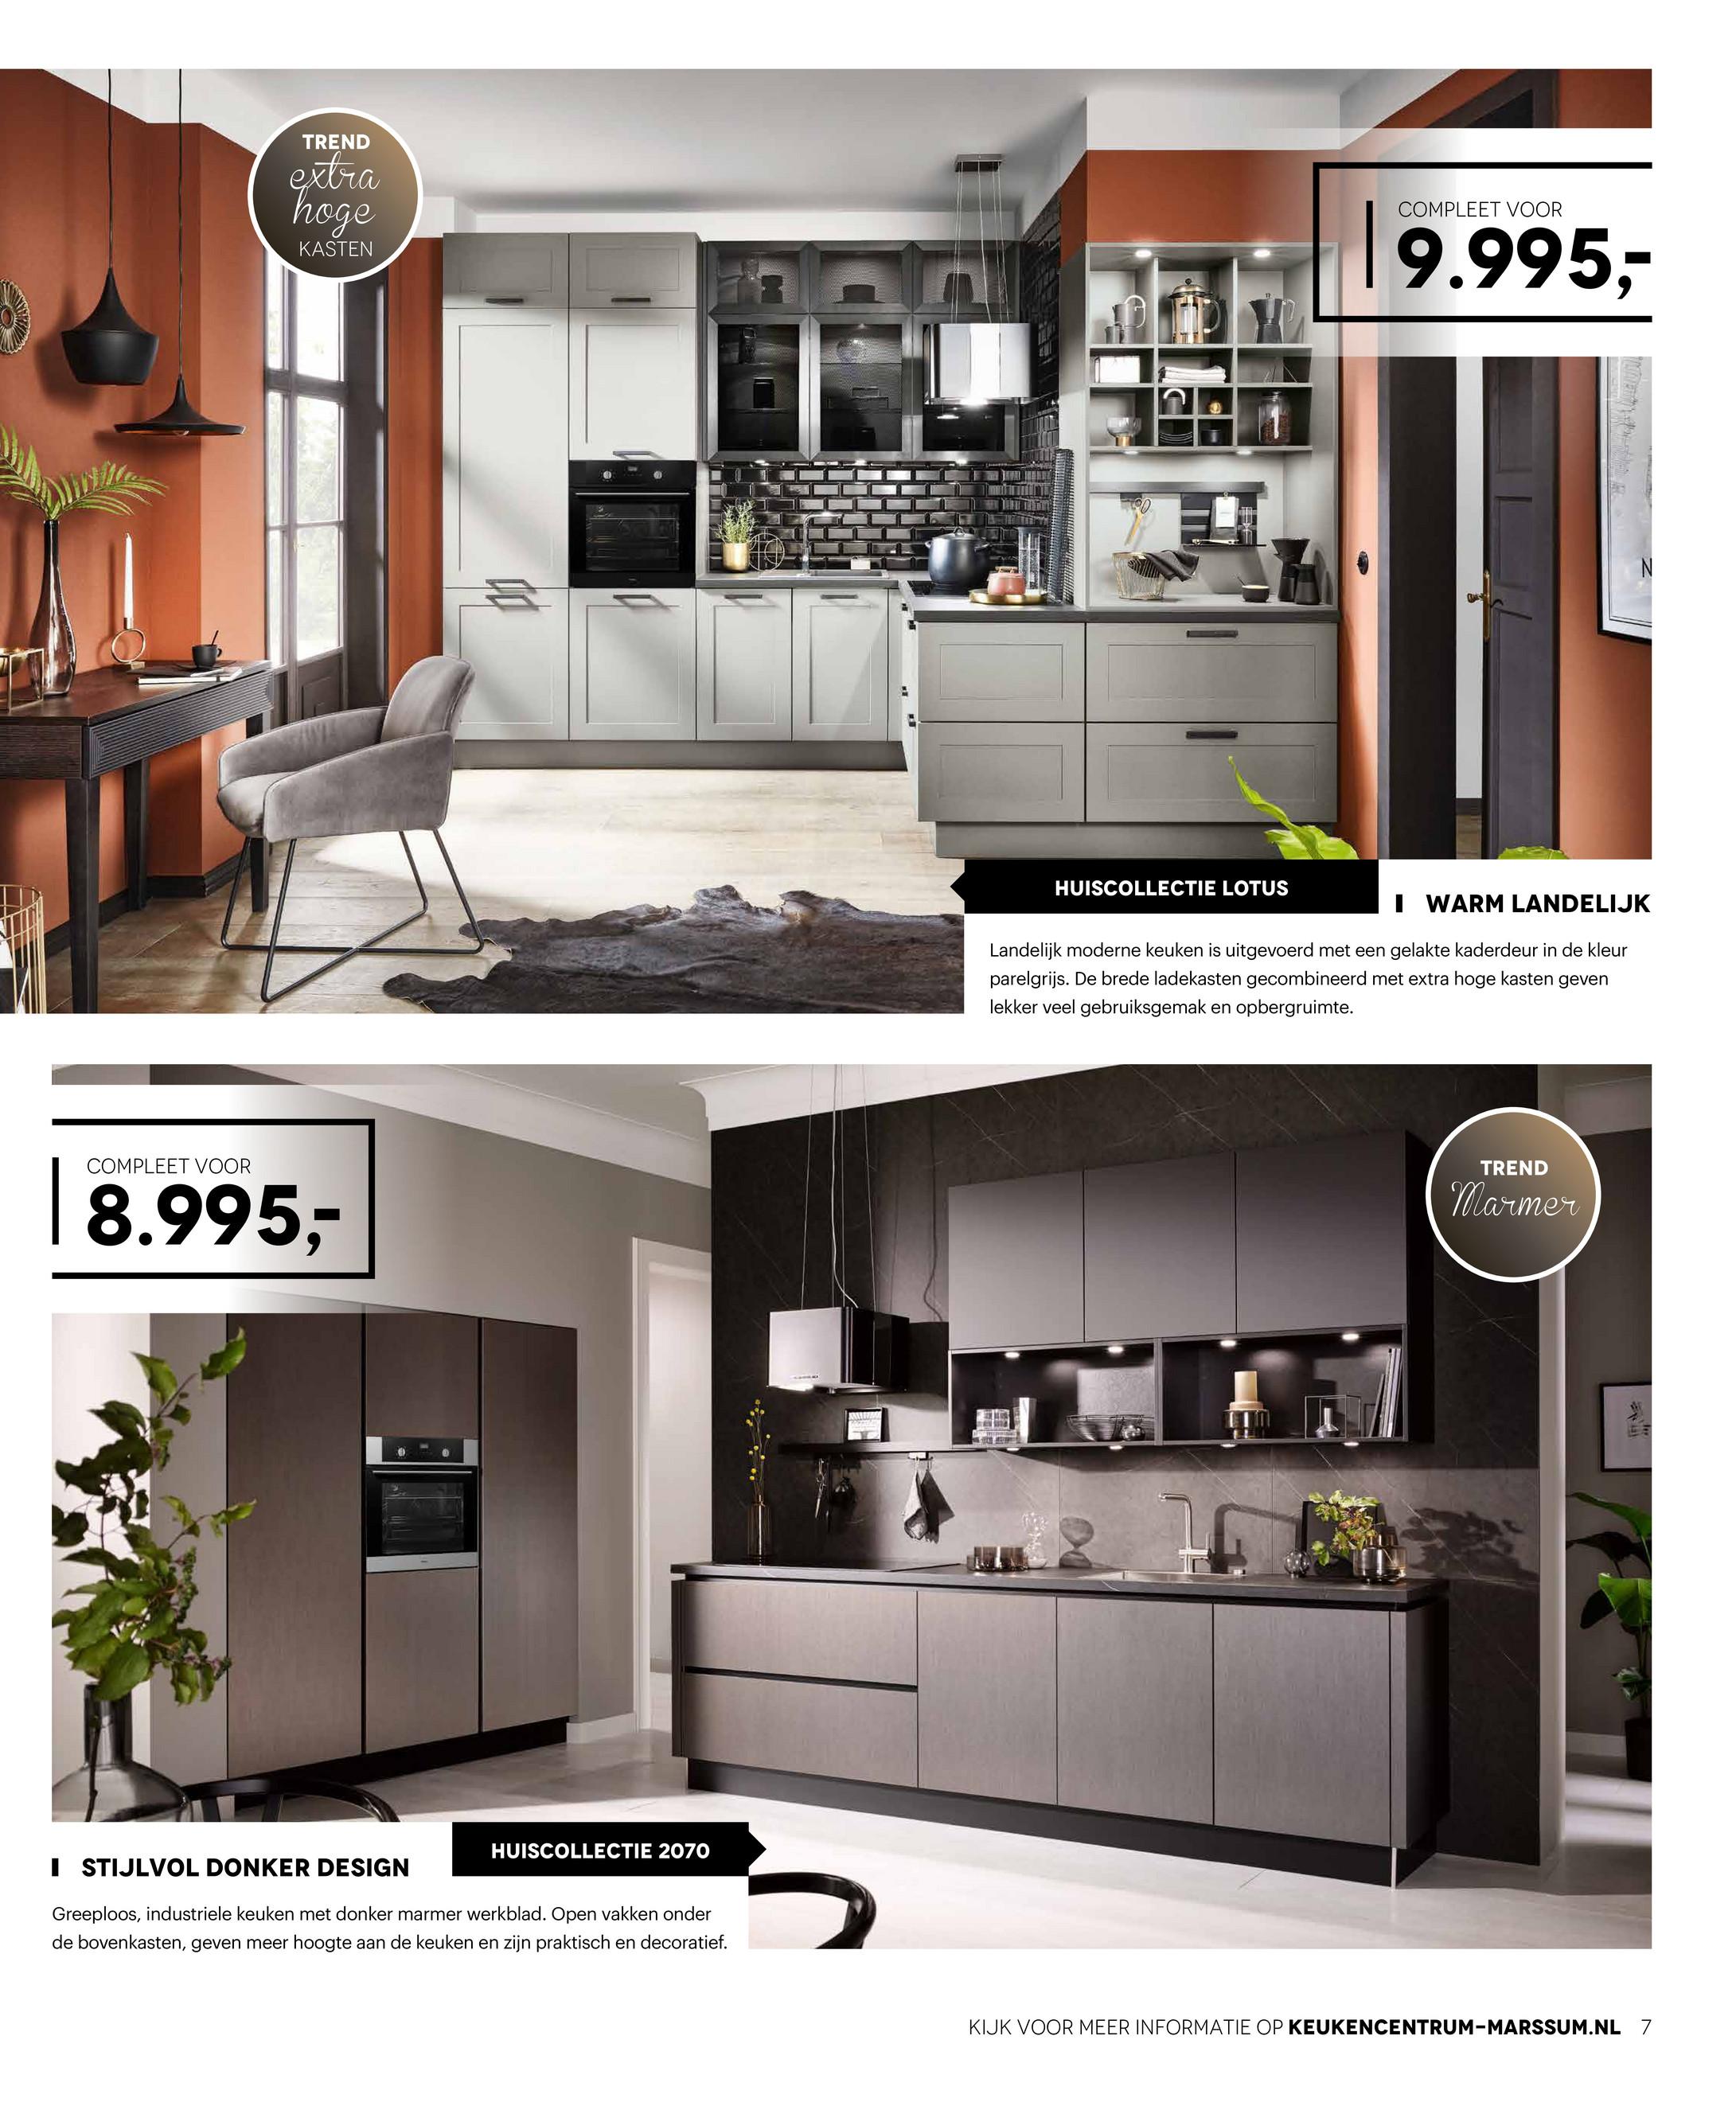 De Mooiste Keukenwinkel De Mooiste Keukenwinkel Folder Week 40 2020 Marssum Pagina 2 3